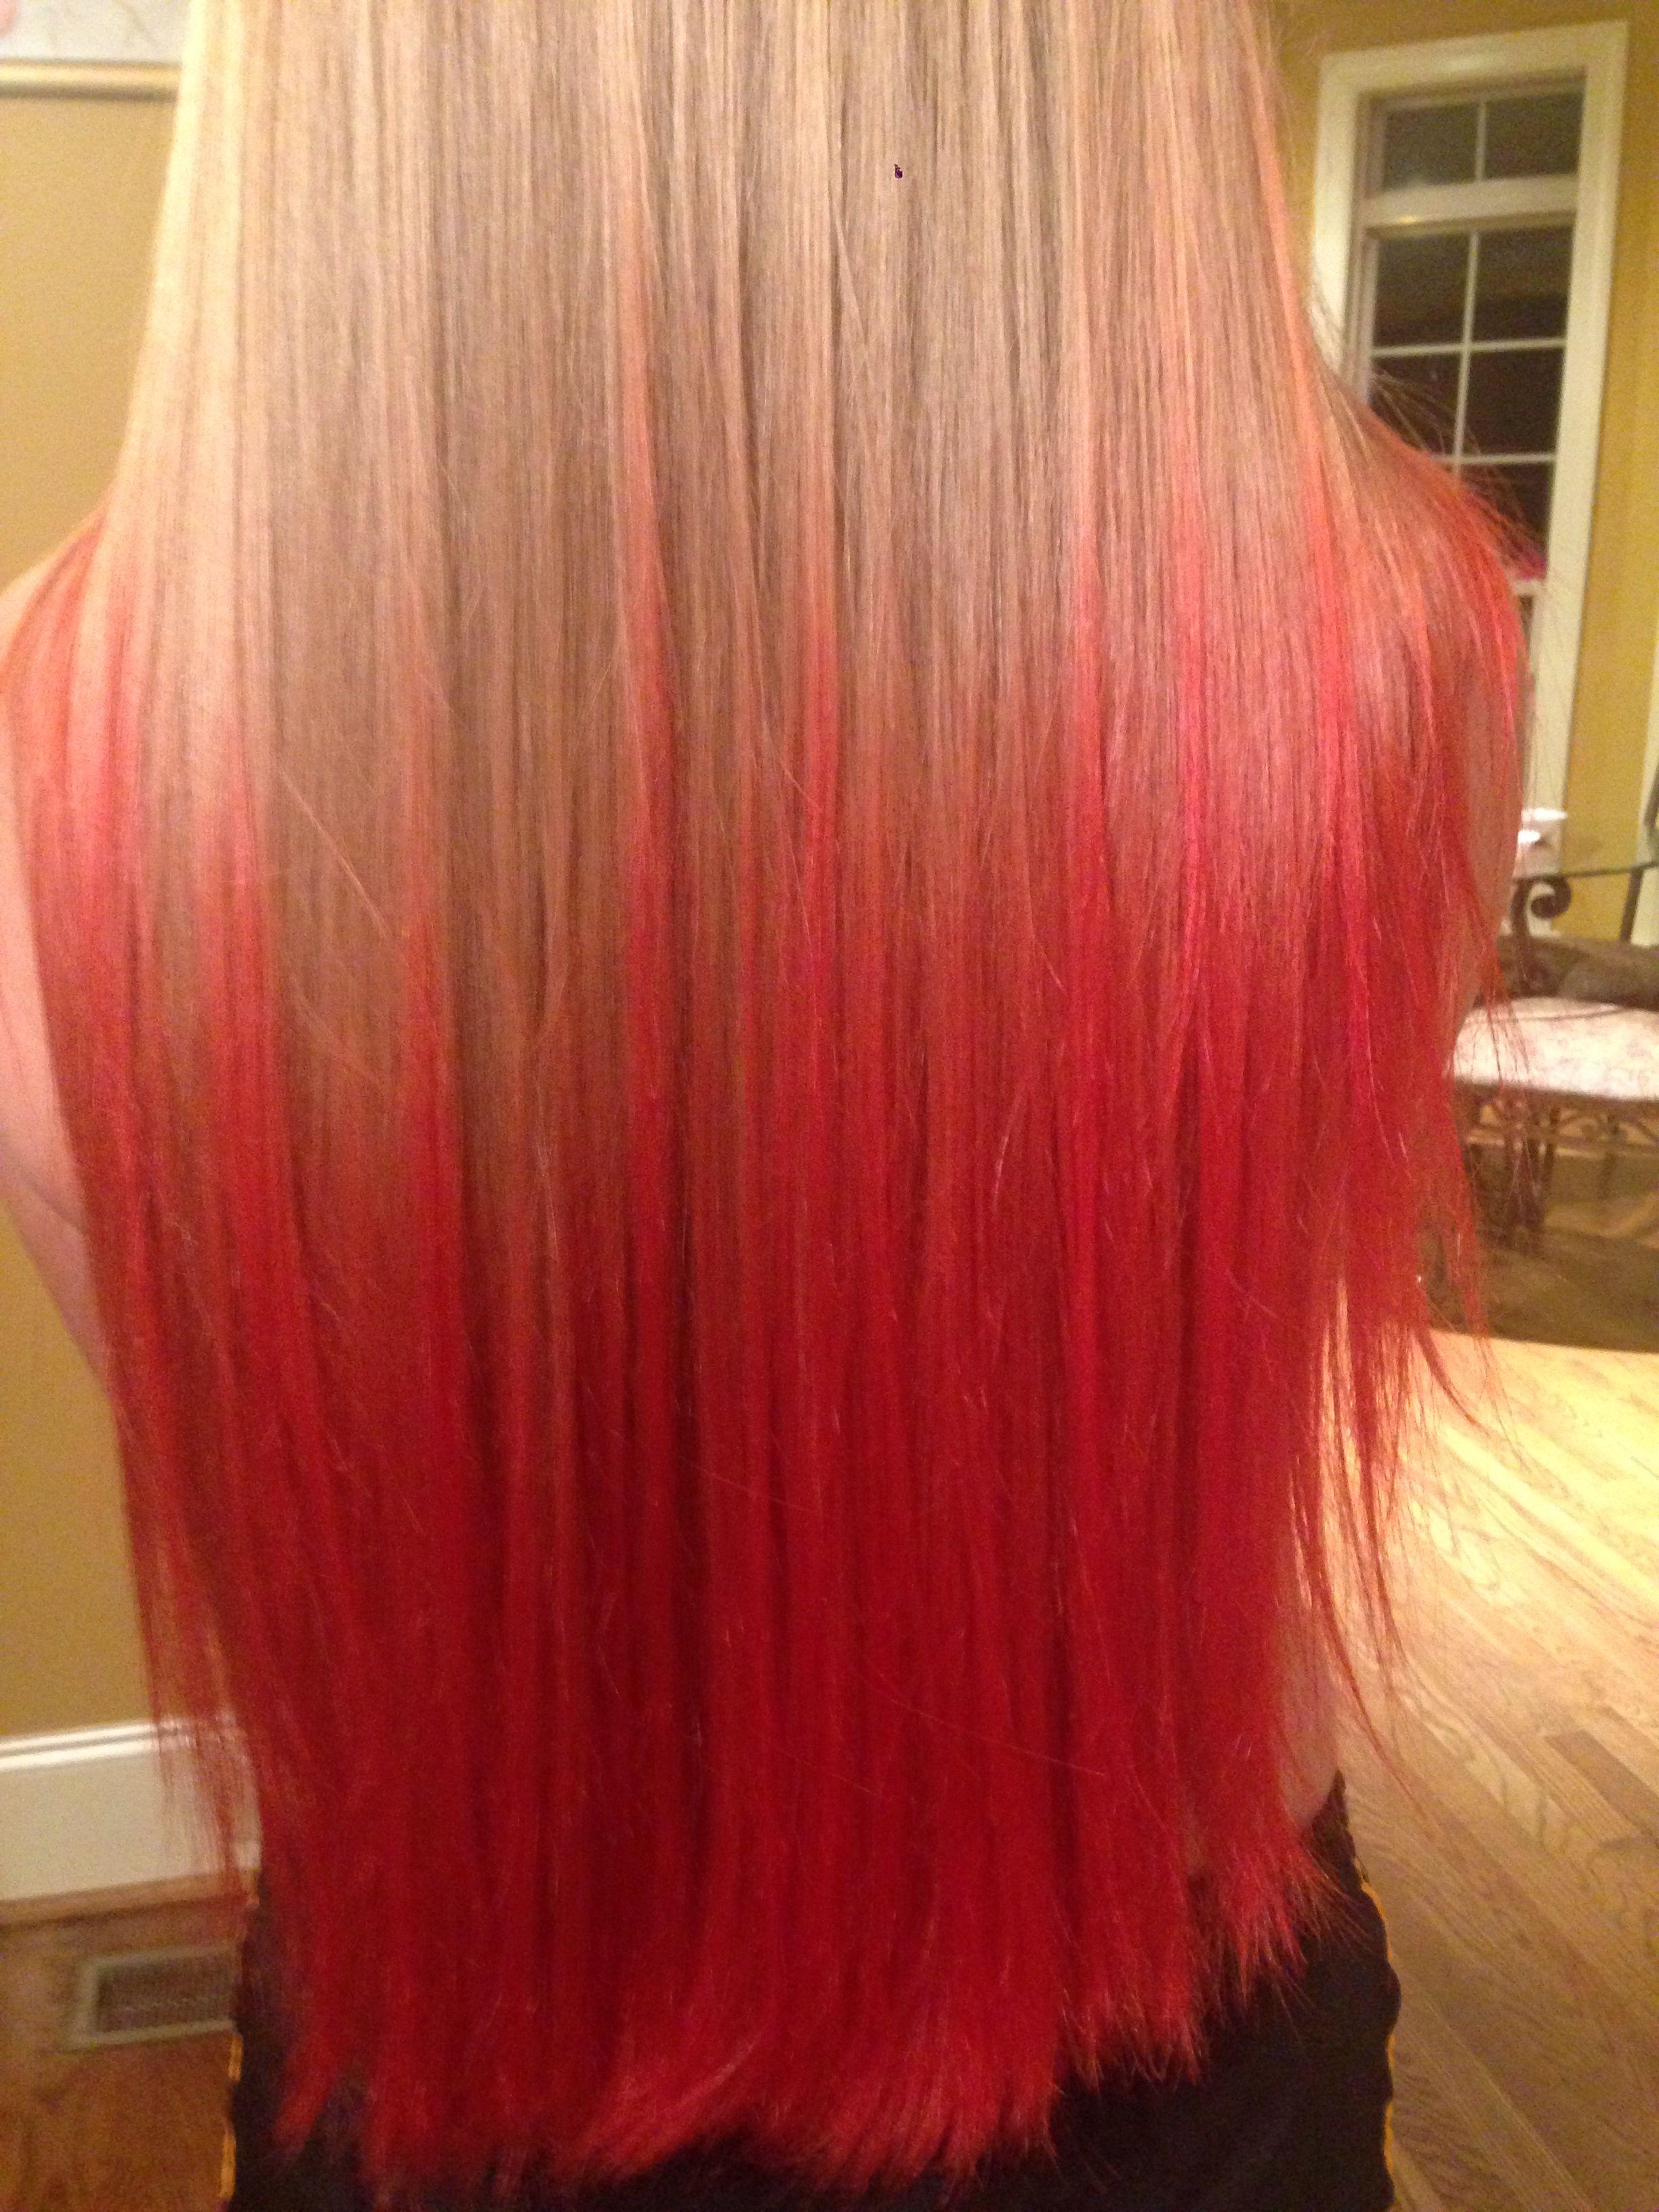 Kool Aid Dip Dyed Hair Cherry Strawberry And Pink Lemonade Kool Aid Hair Kool Aid Hair Dye Dip Dye Hair